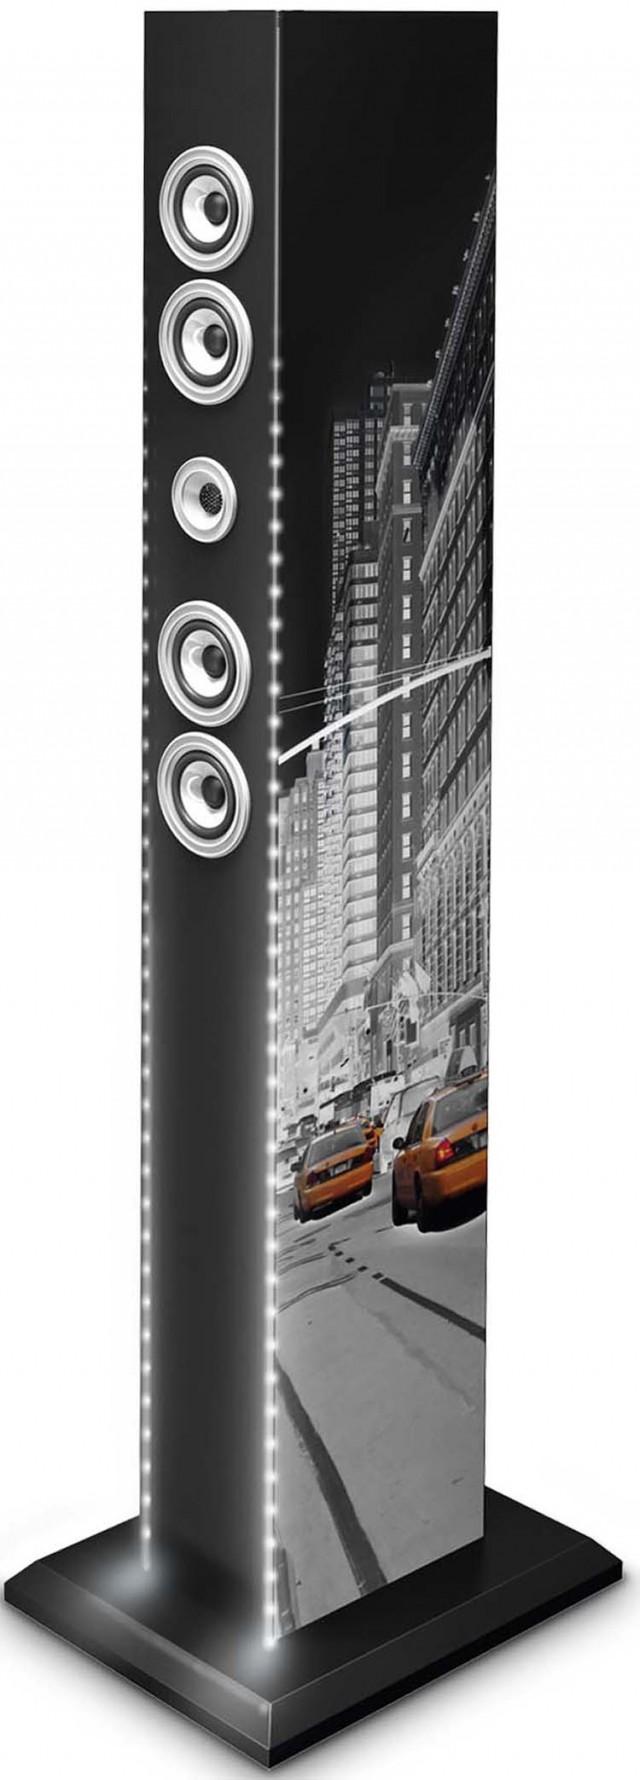 Tour Multimedia 'NY' - Packshot